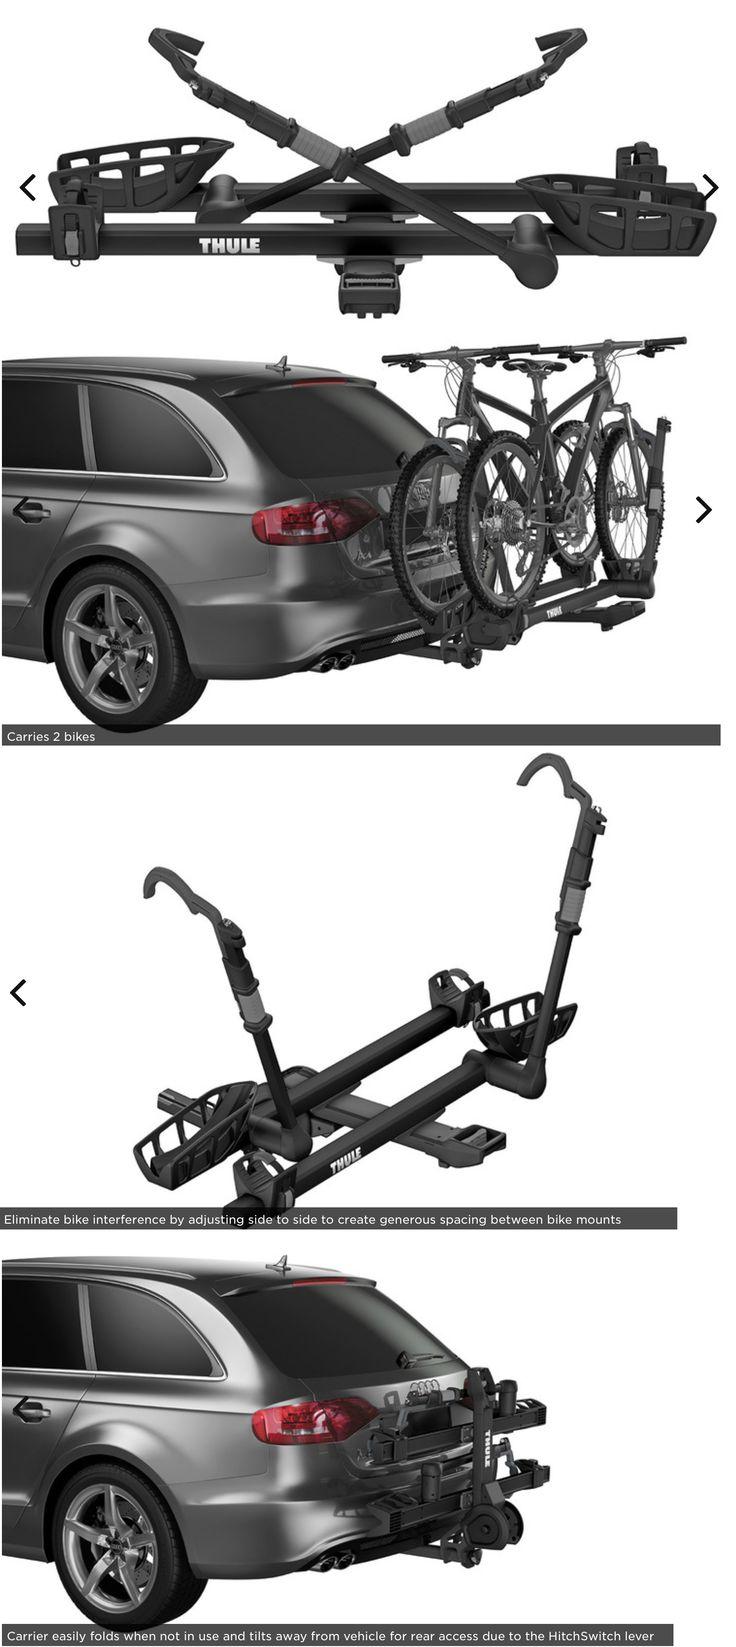 Car and truck racks 177849 new thule t2 pro xt black 2 bike rack